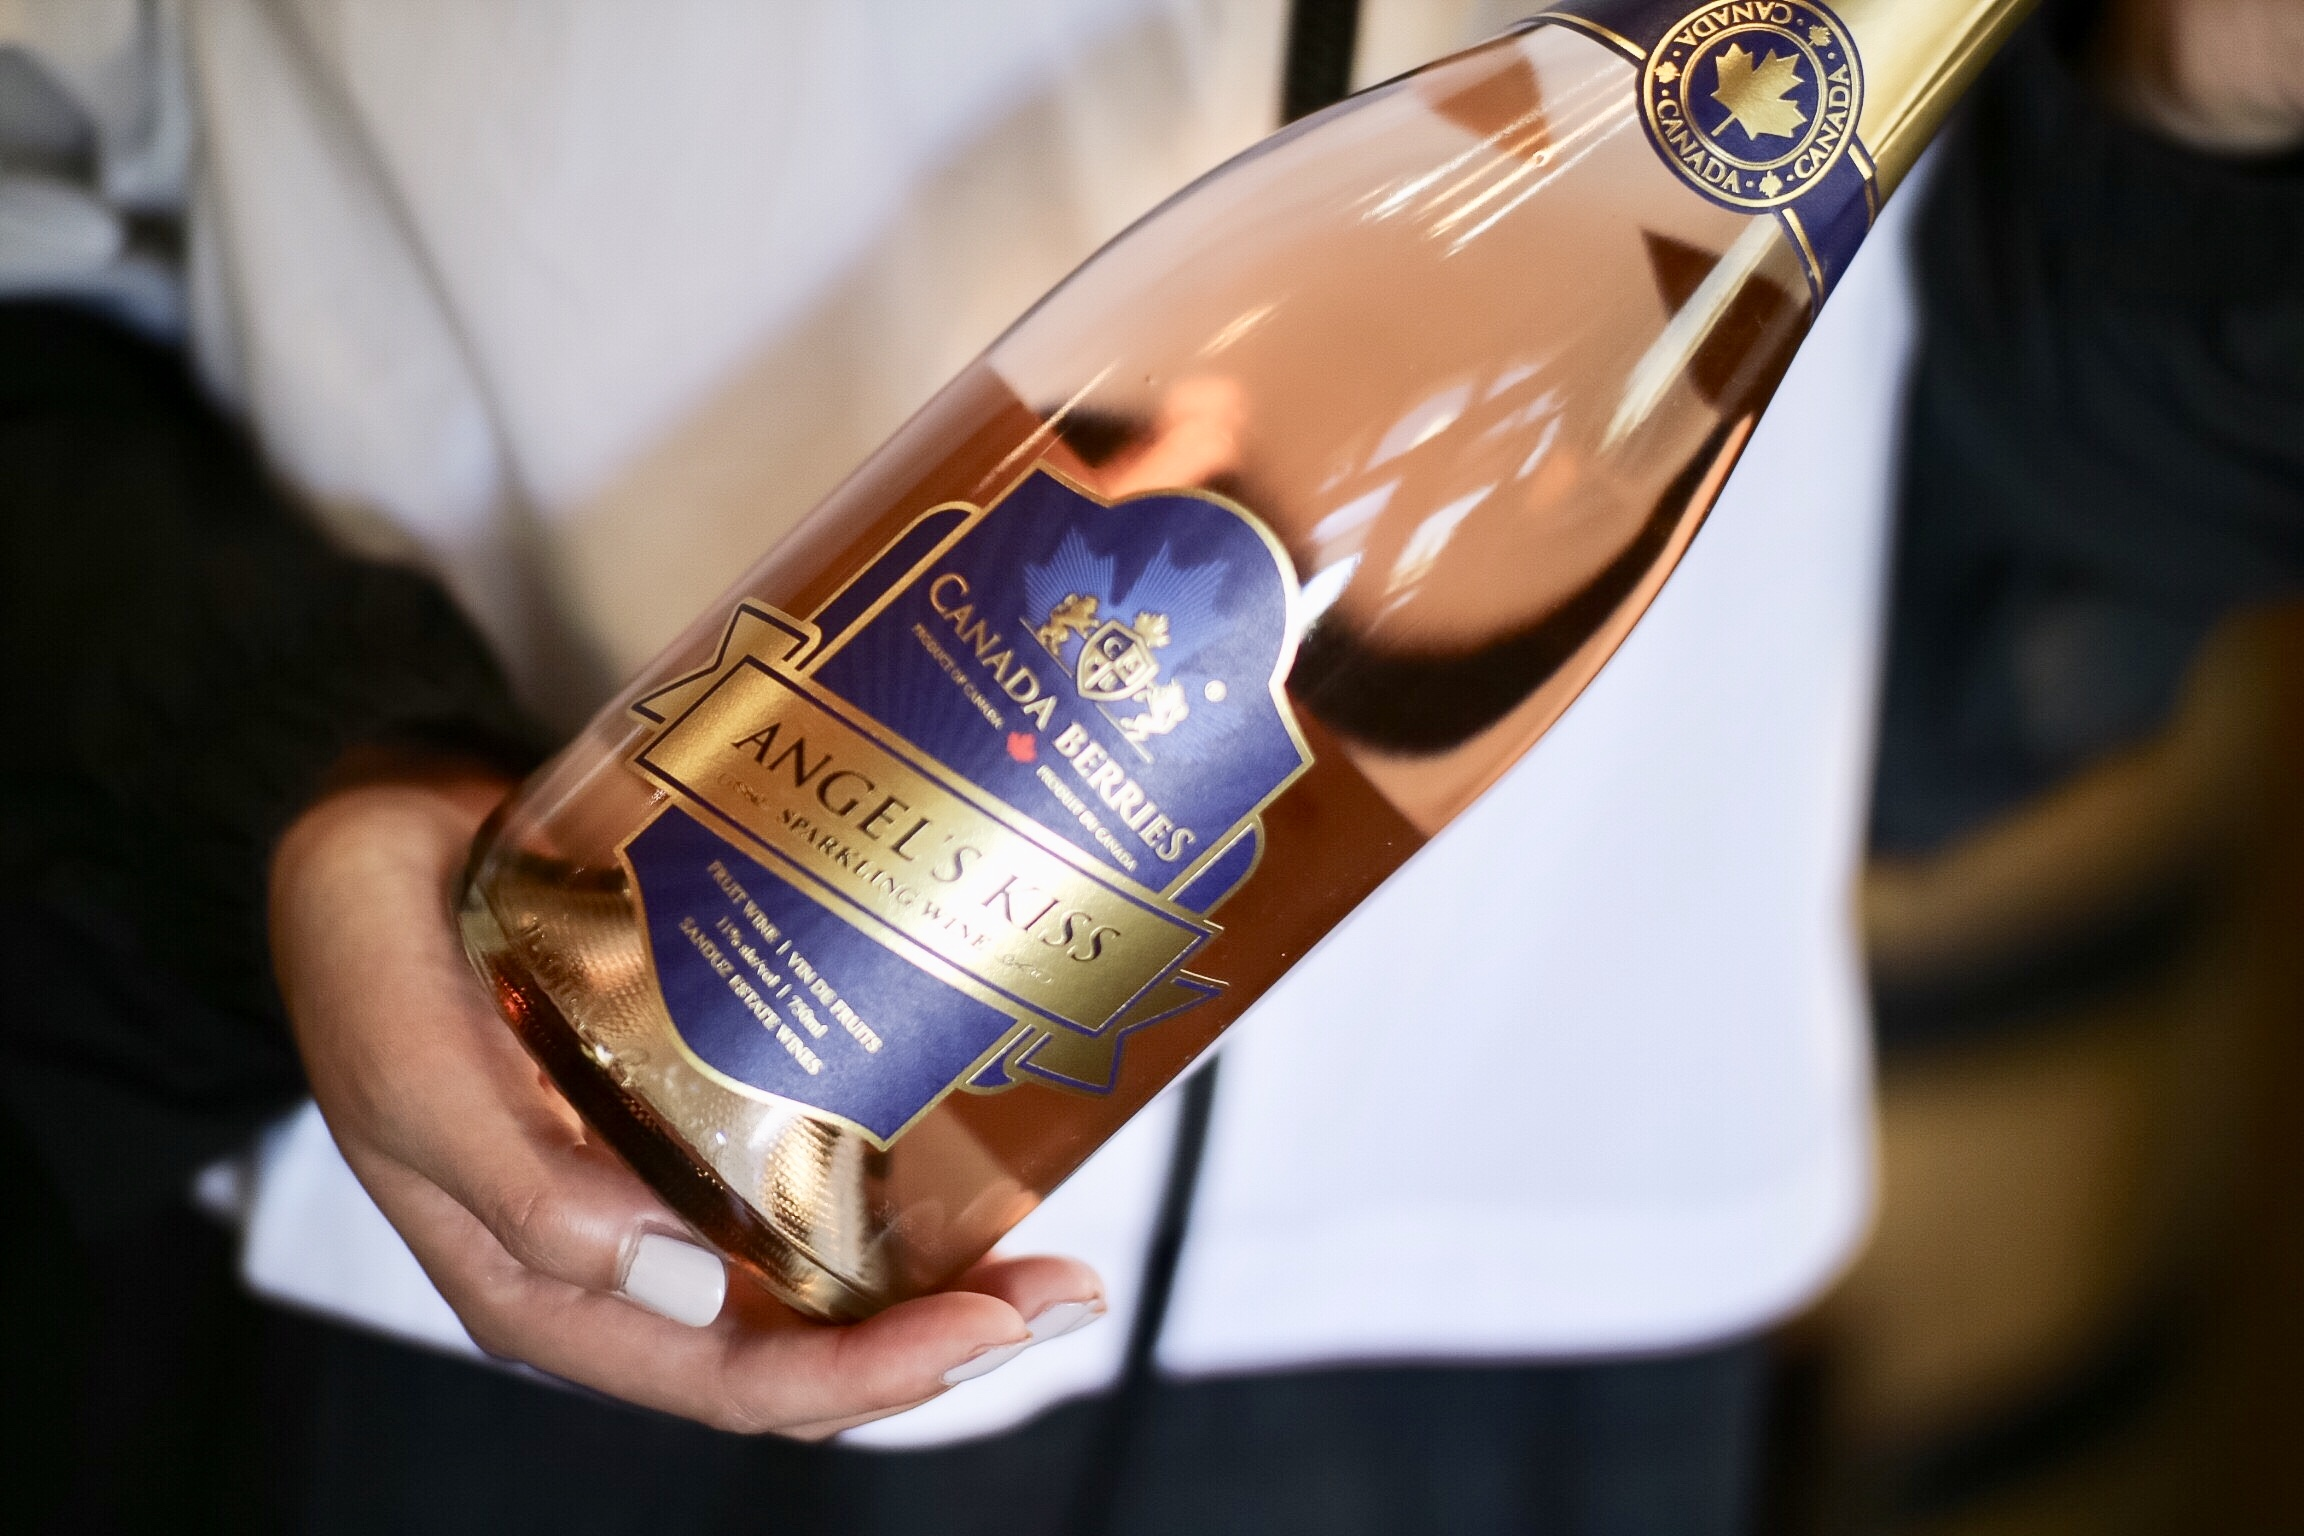 Angel's Kiss Sparkling Wine